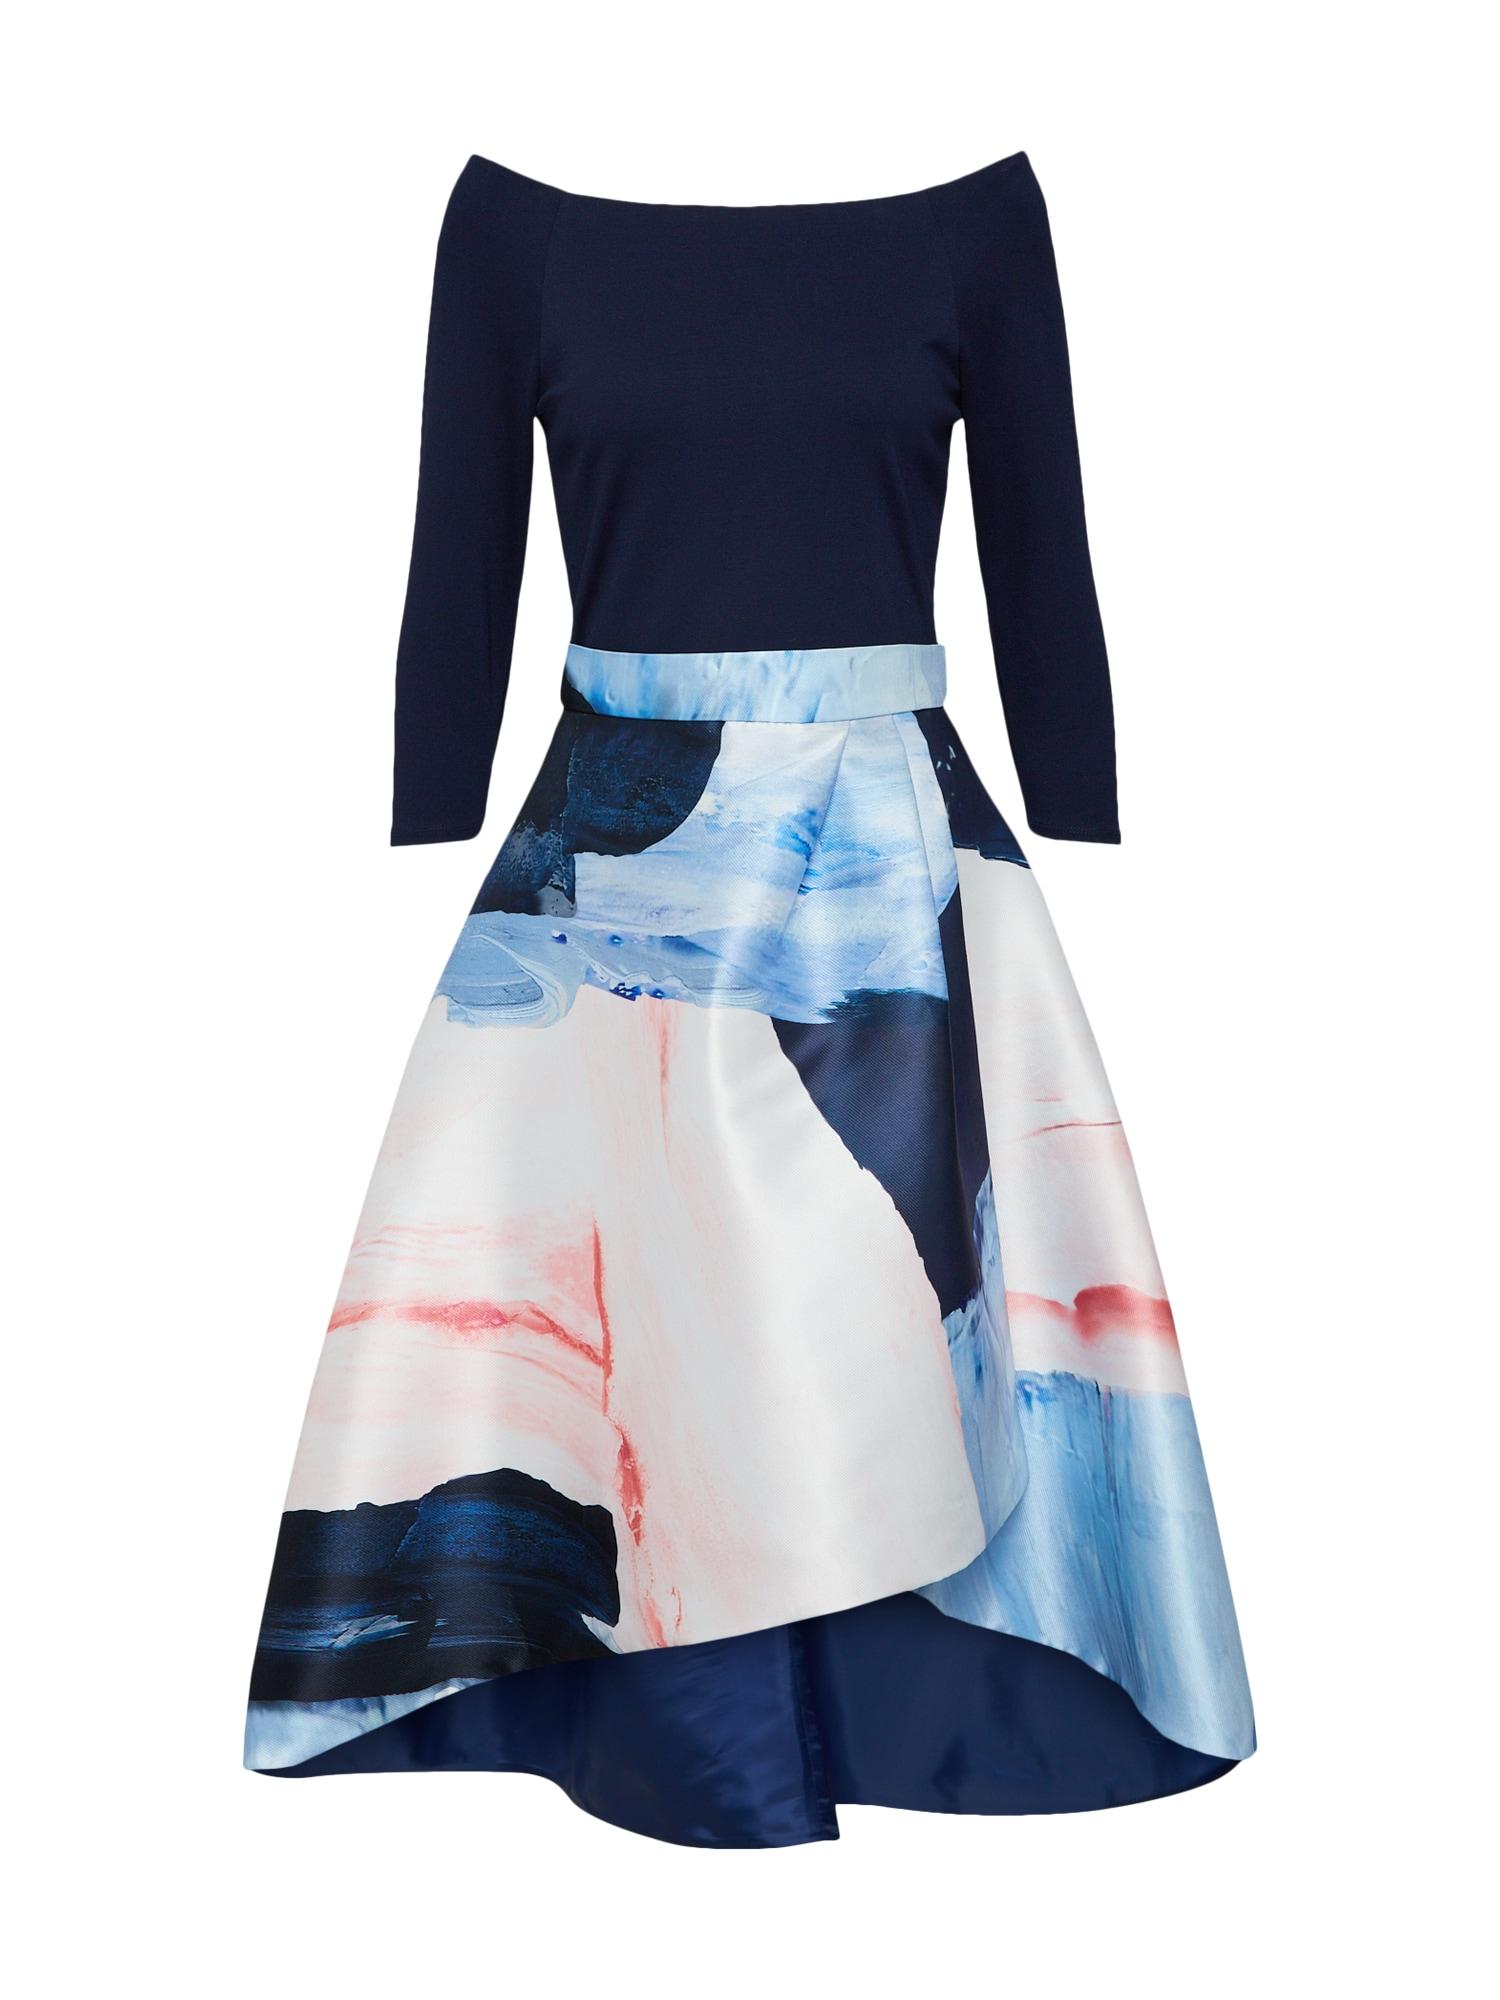 Šaty Marini Chloi noční modrá mix barev Coast